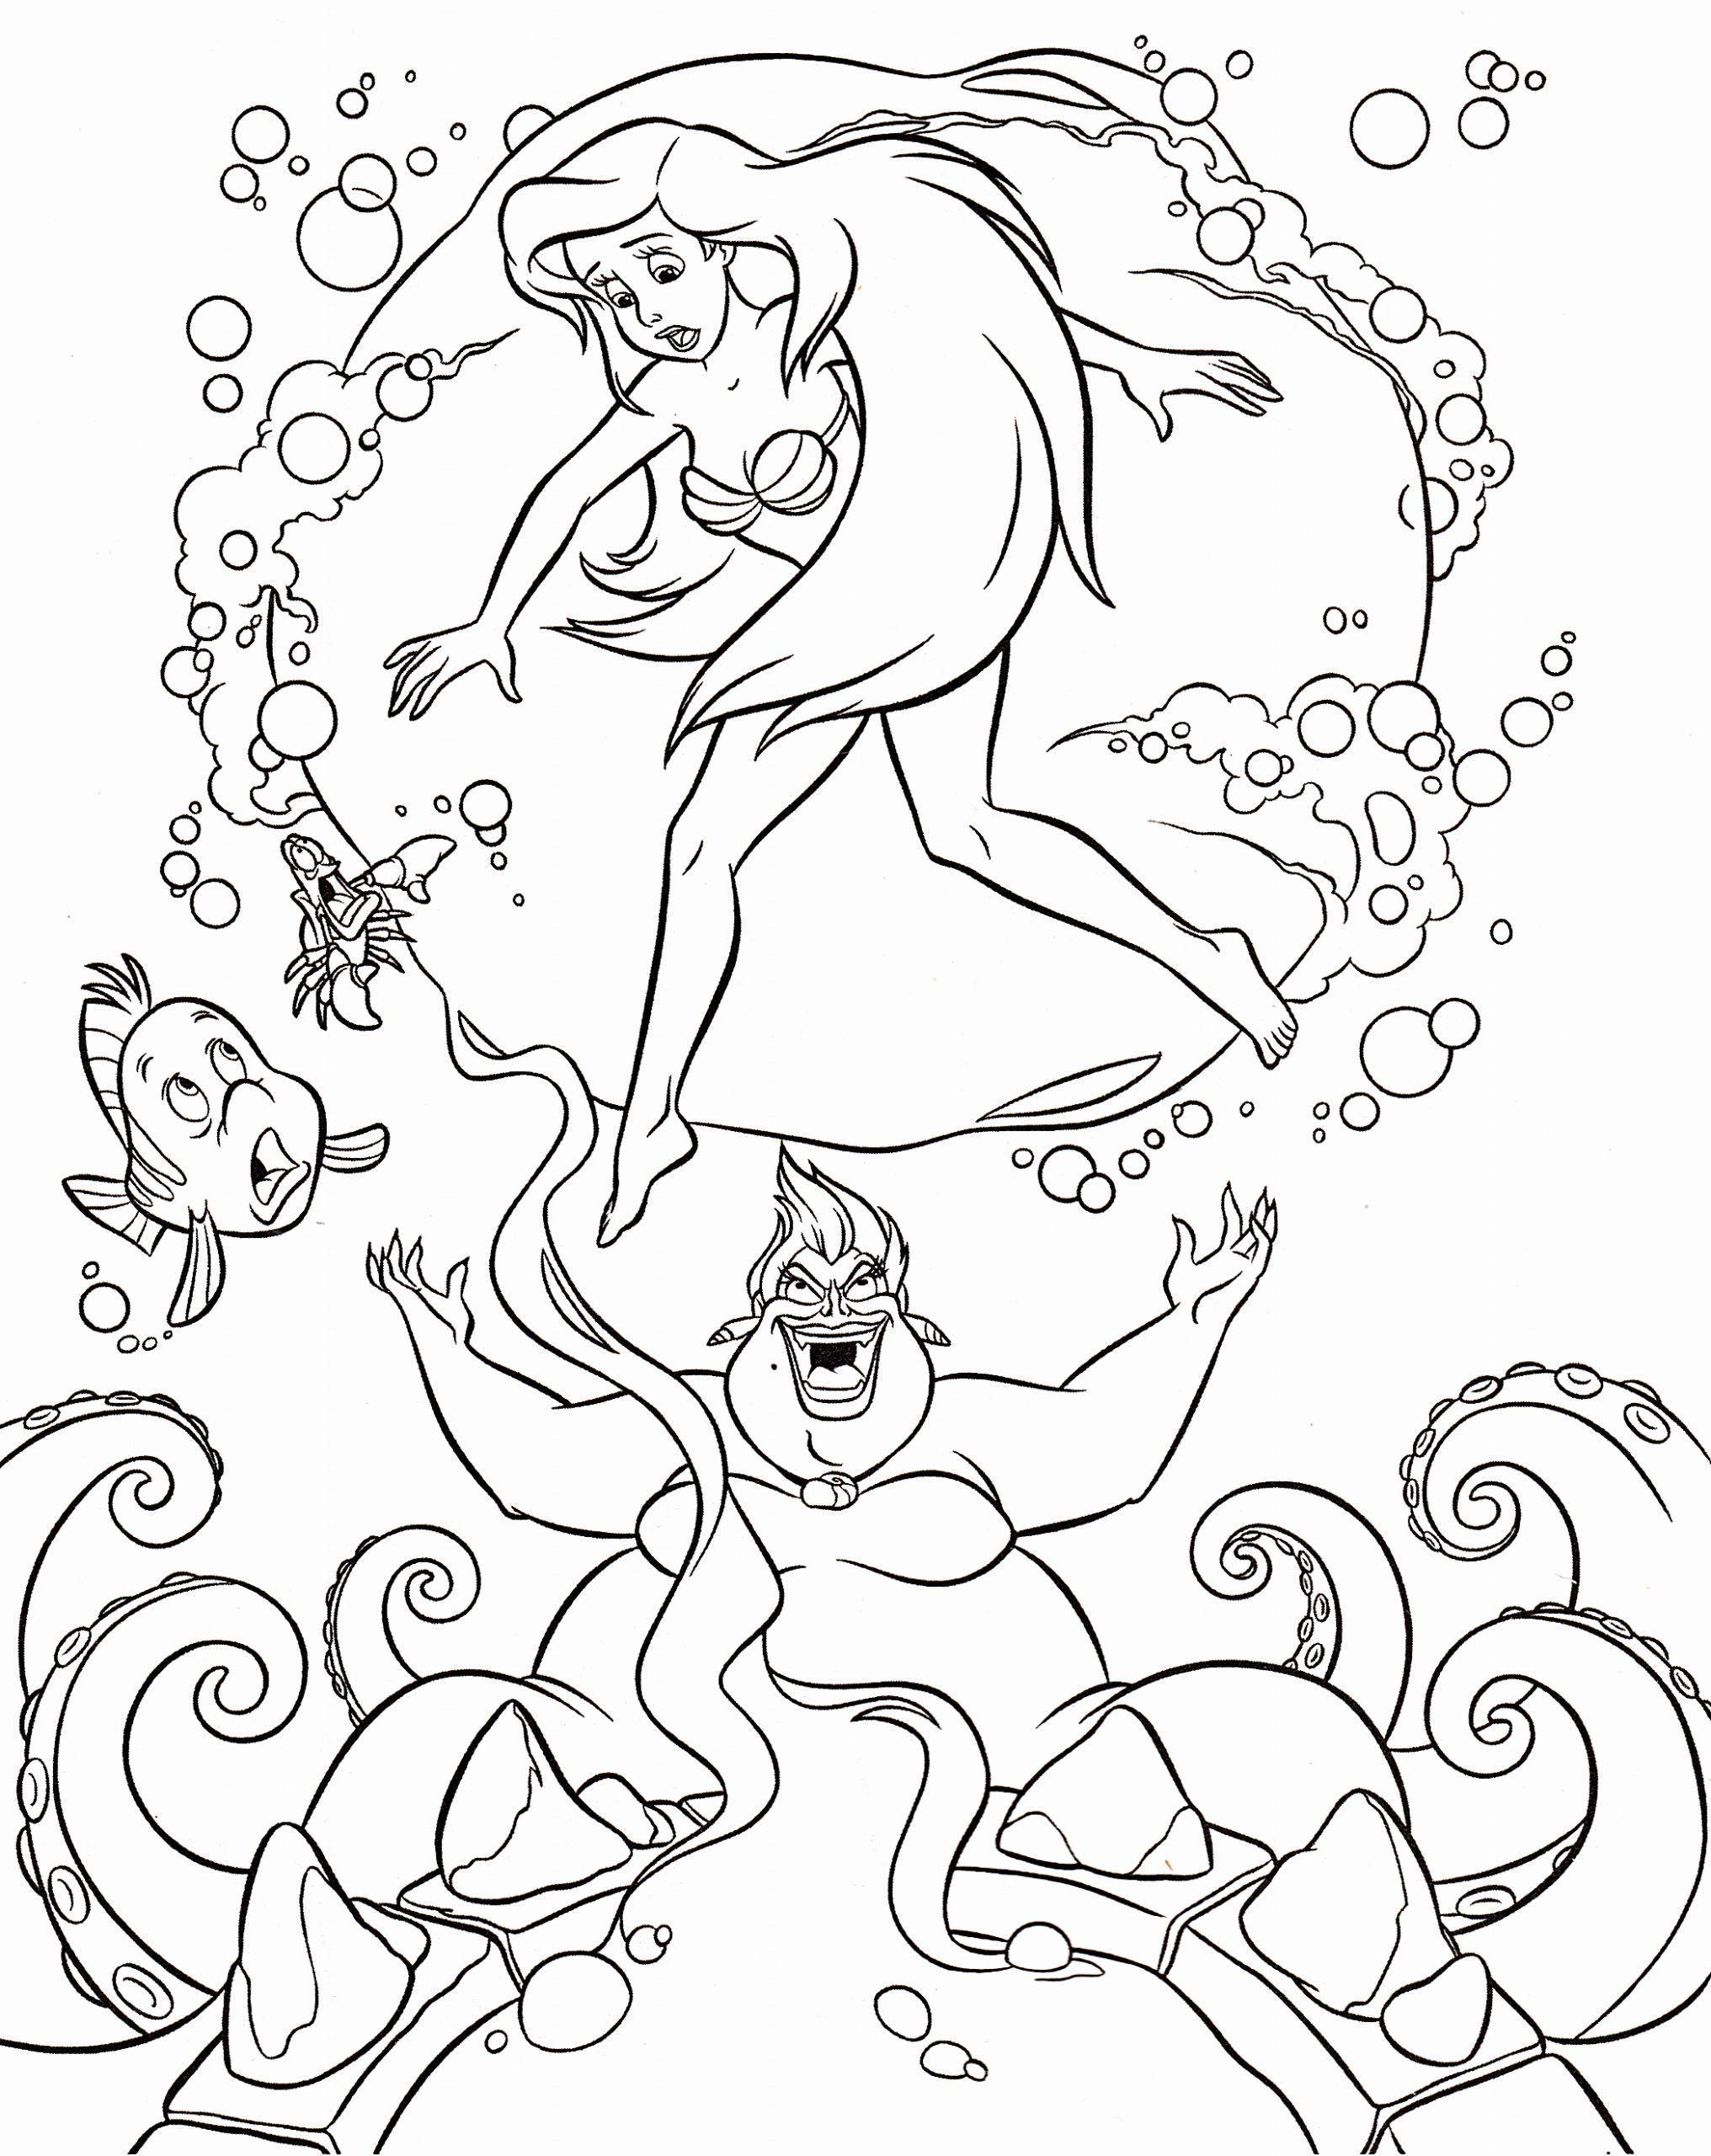 Disney Princess Ariel Coloring Pages Luxury Colouring Pages Ariel Coloring Pages Disney Coloring Pages Disney Princess Coloring Pages